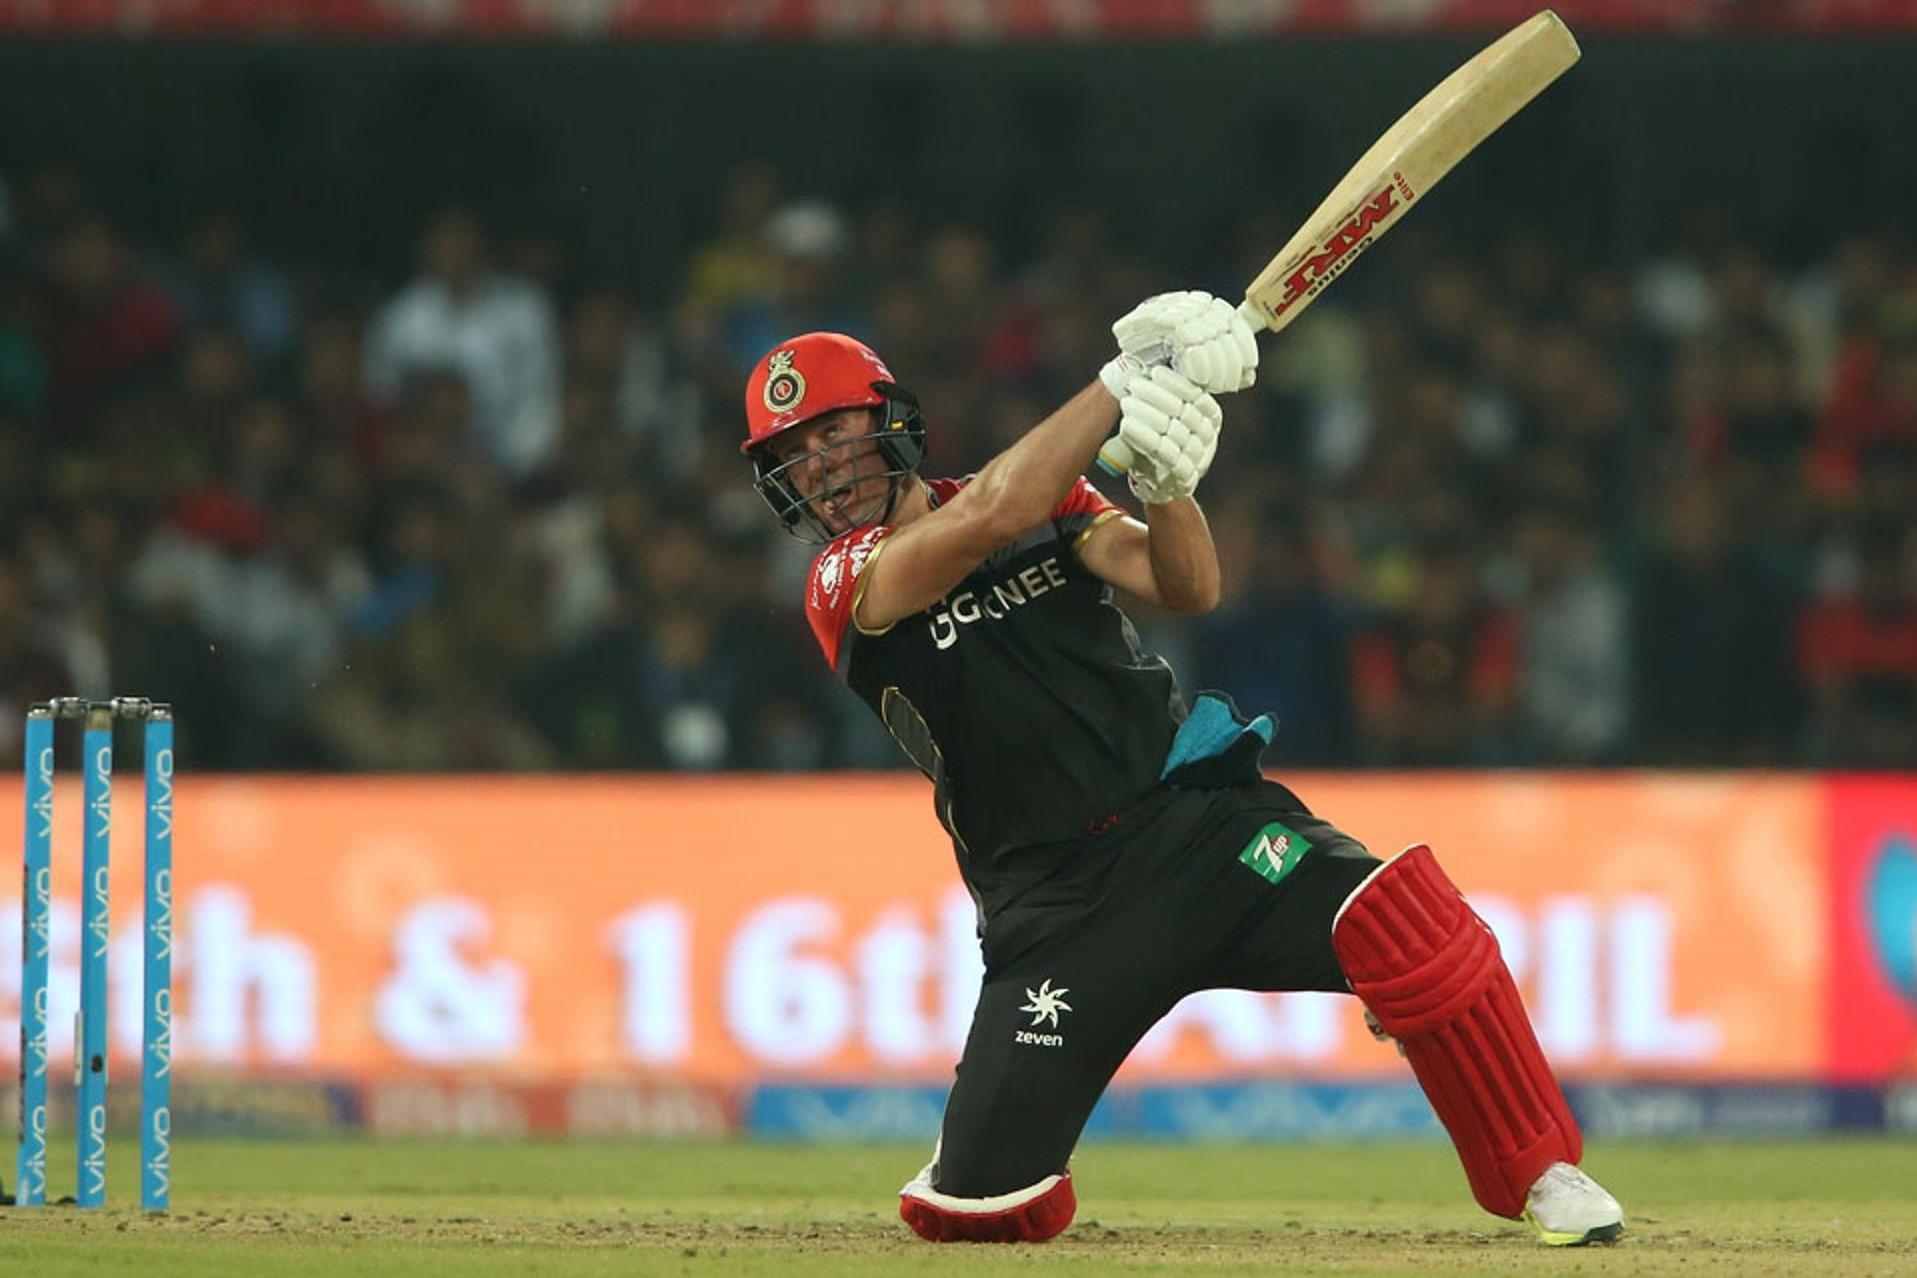 IPL10: KXIP vs RCB: मैच रिकार्ड्स: एबी डीविलियर्स के बड़े बड़े रिकार्ड्स के सामने फीकी रही पंजाब की जीत